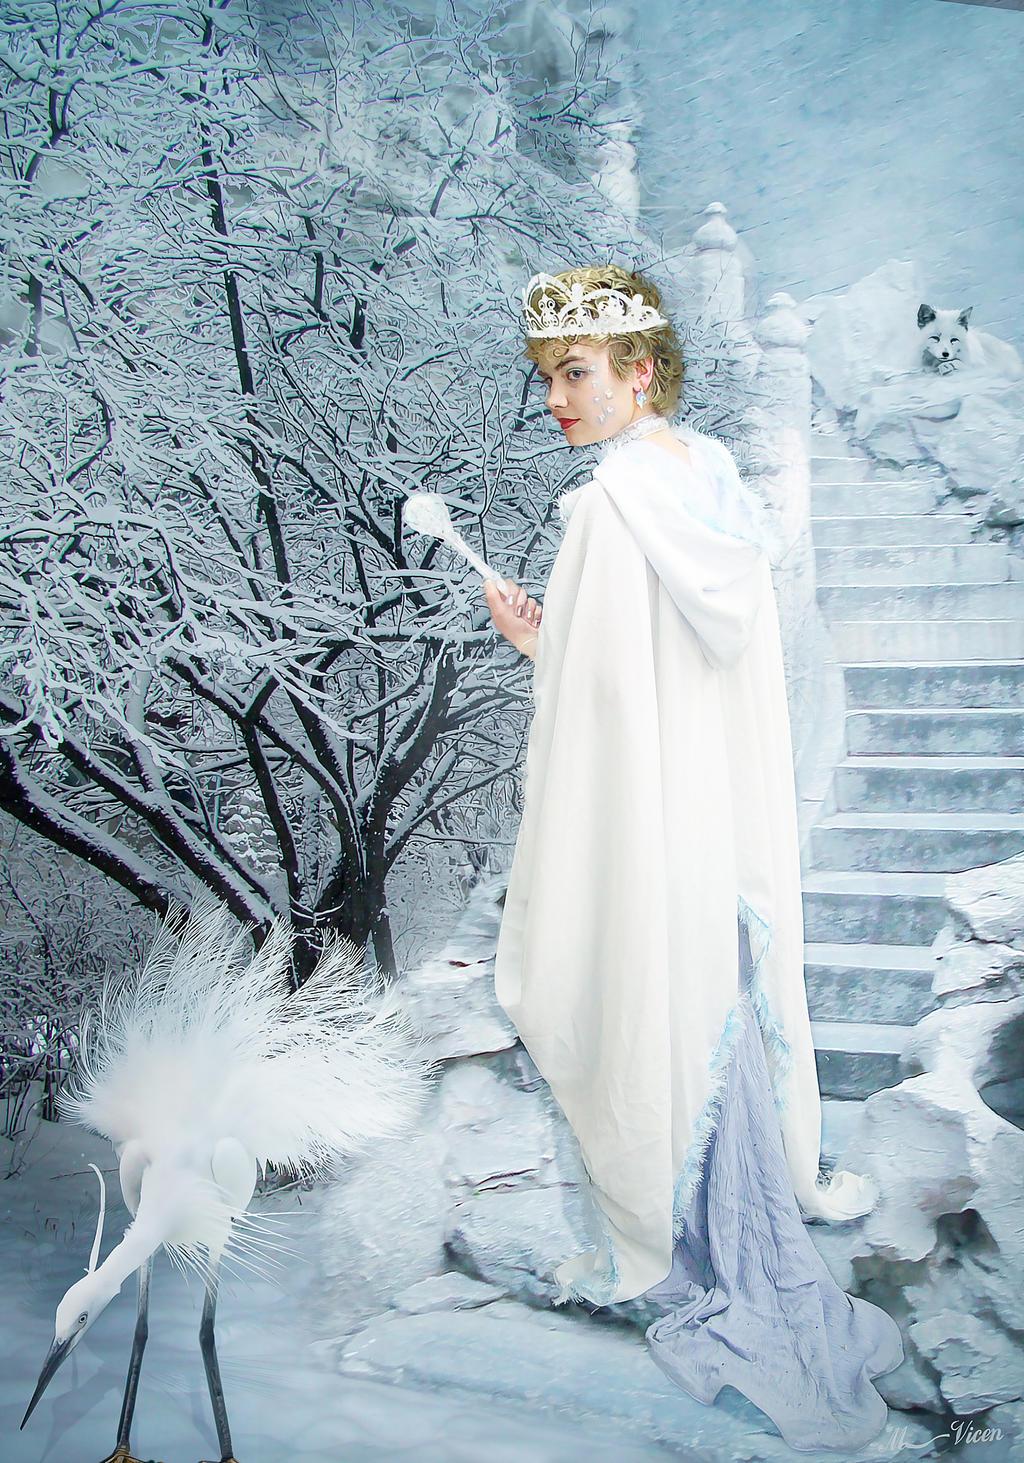 Snow Queen . Reina de las Nieves by Mvicen